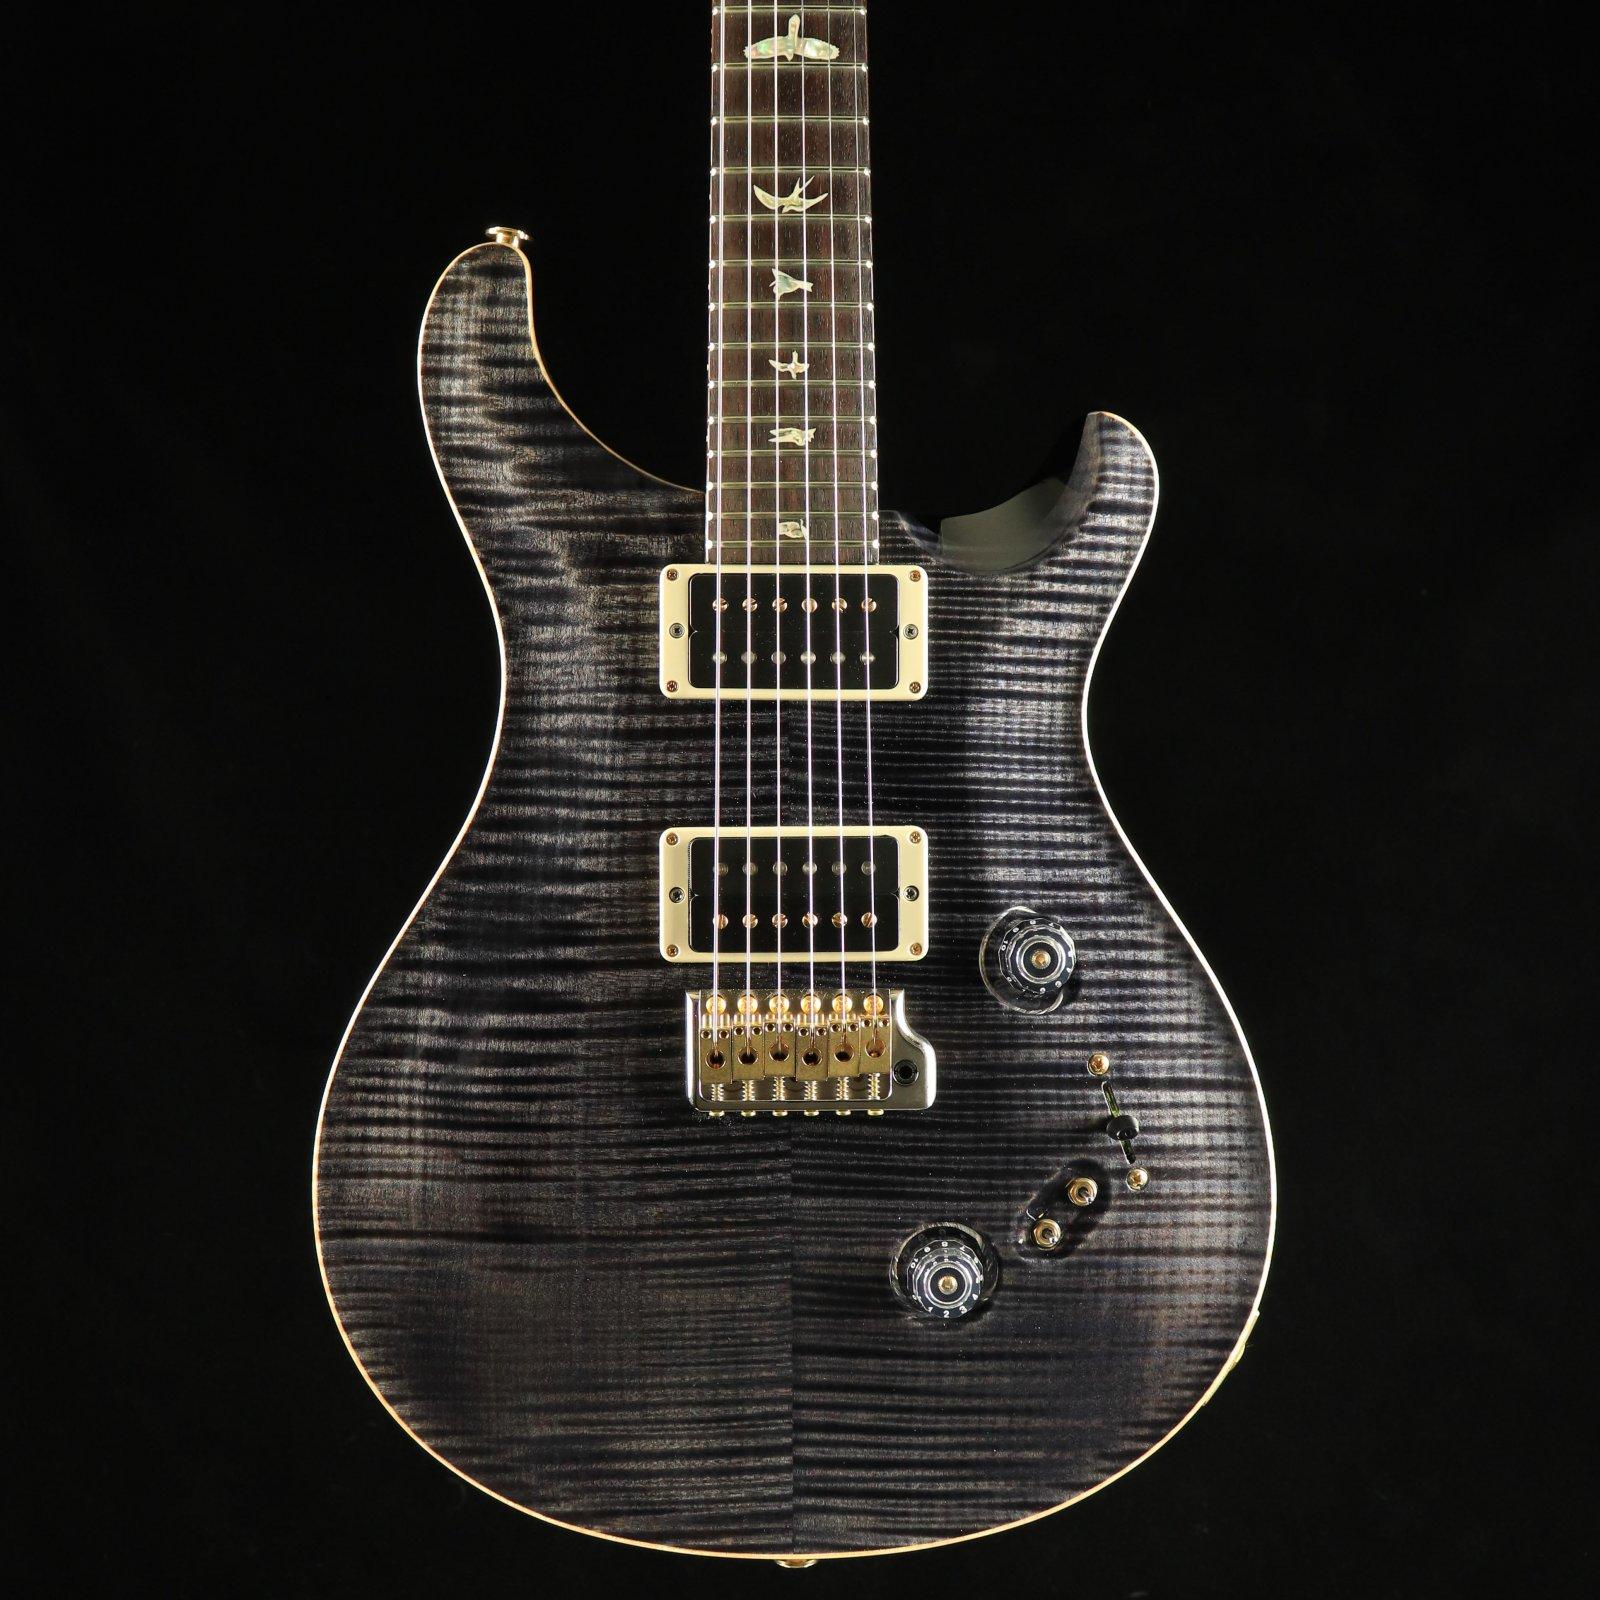 PRS Custom 24-08 - Gray Black